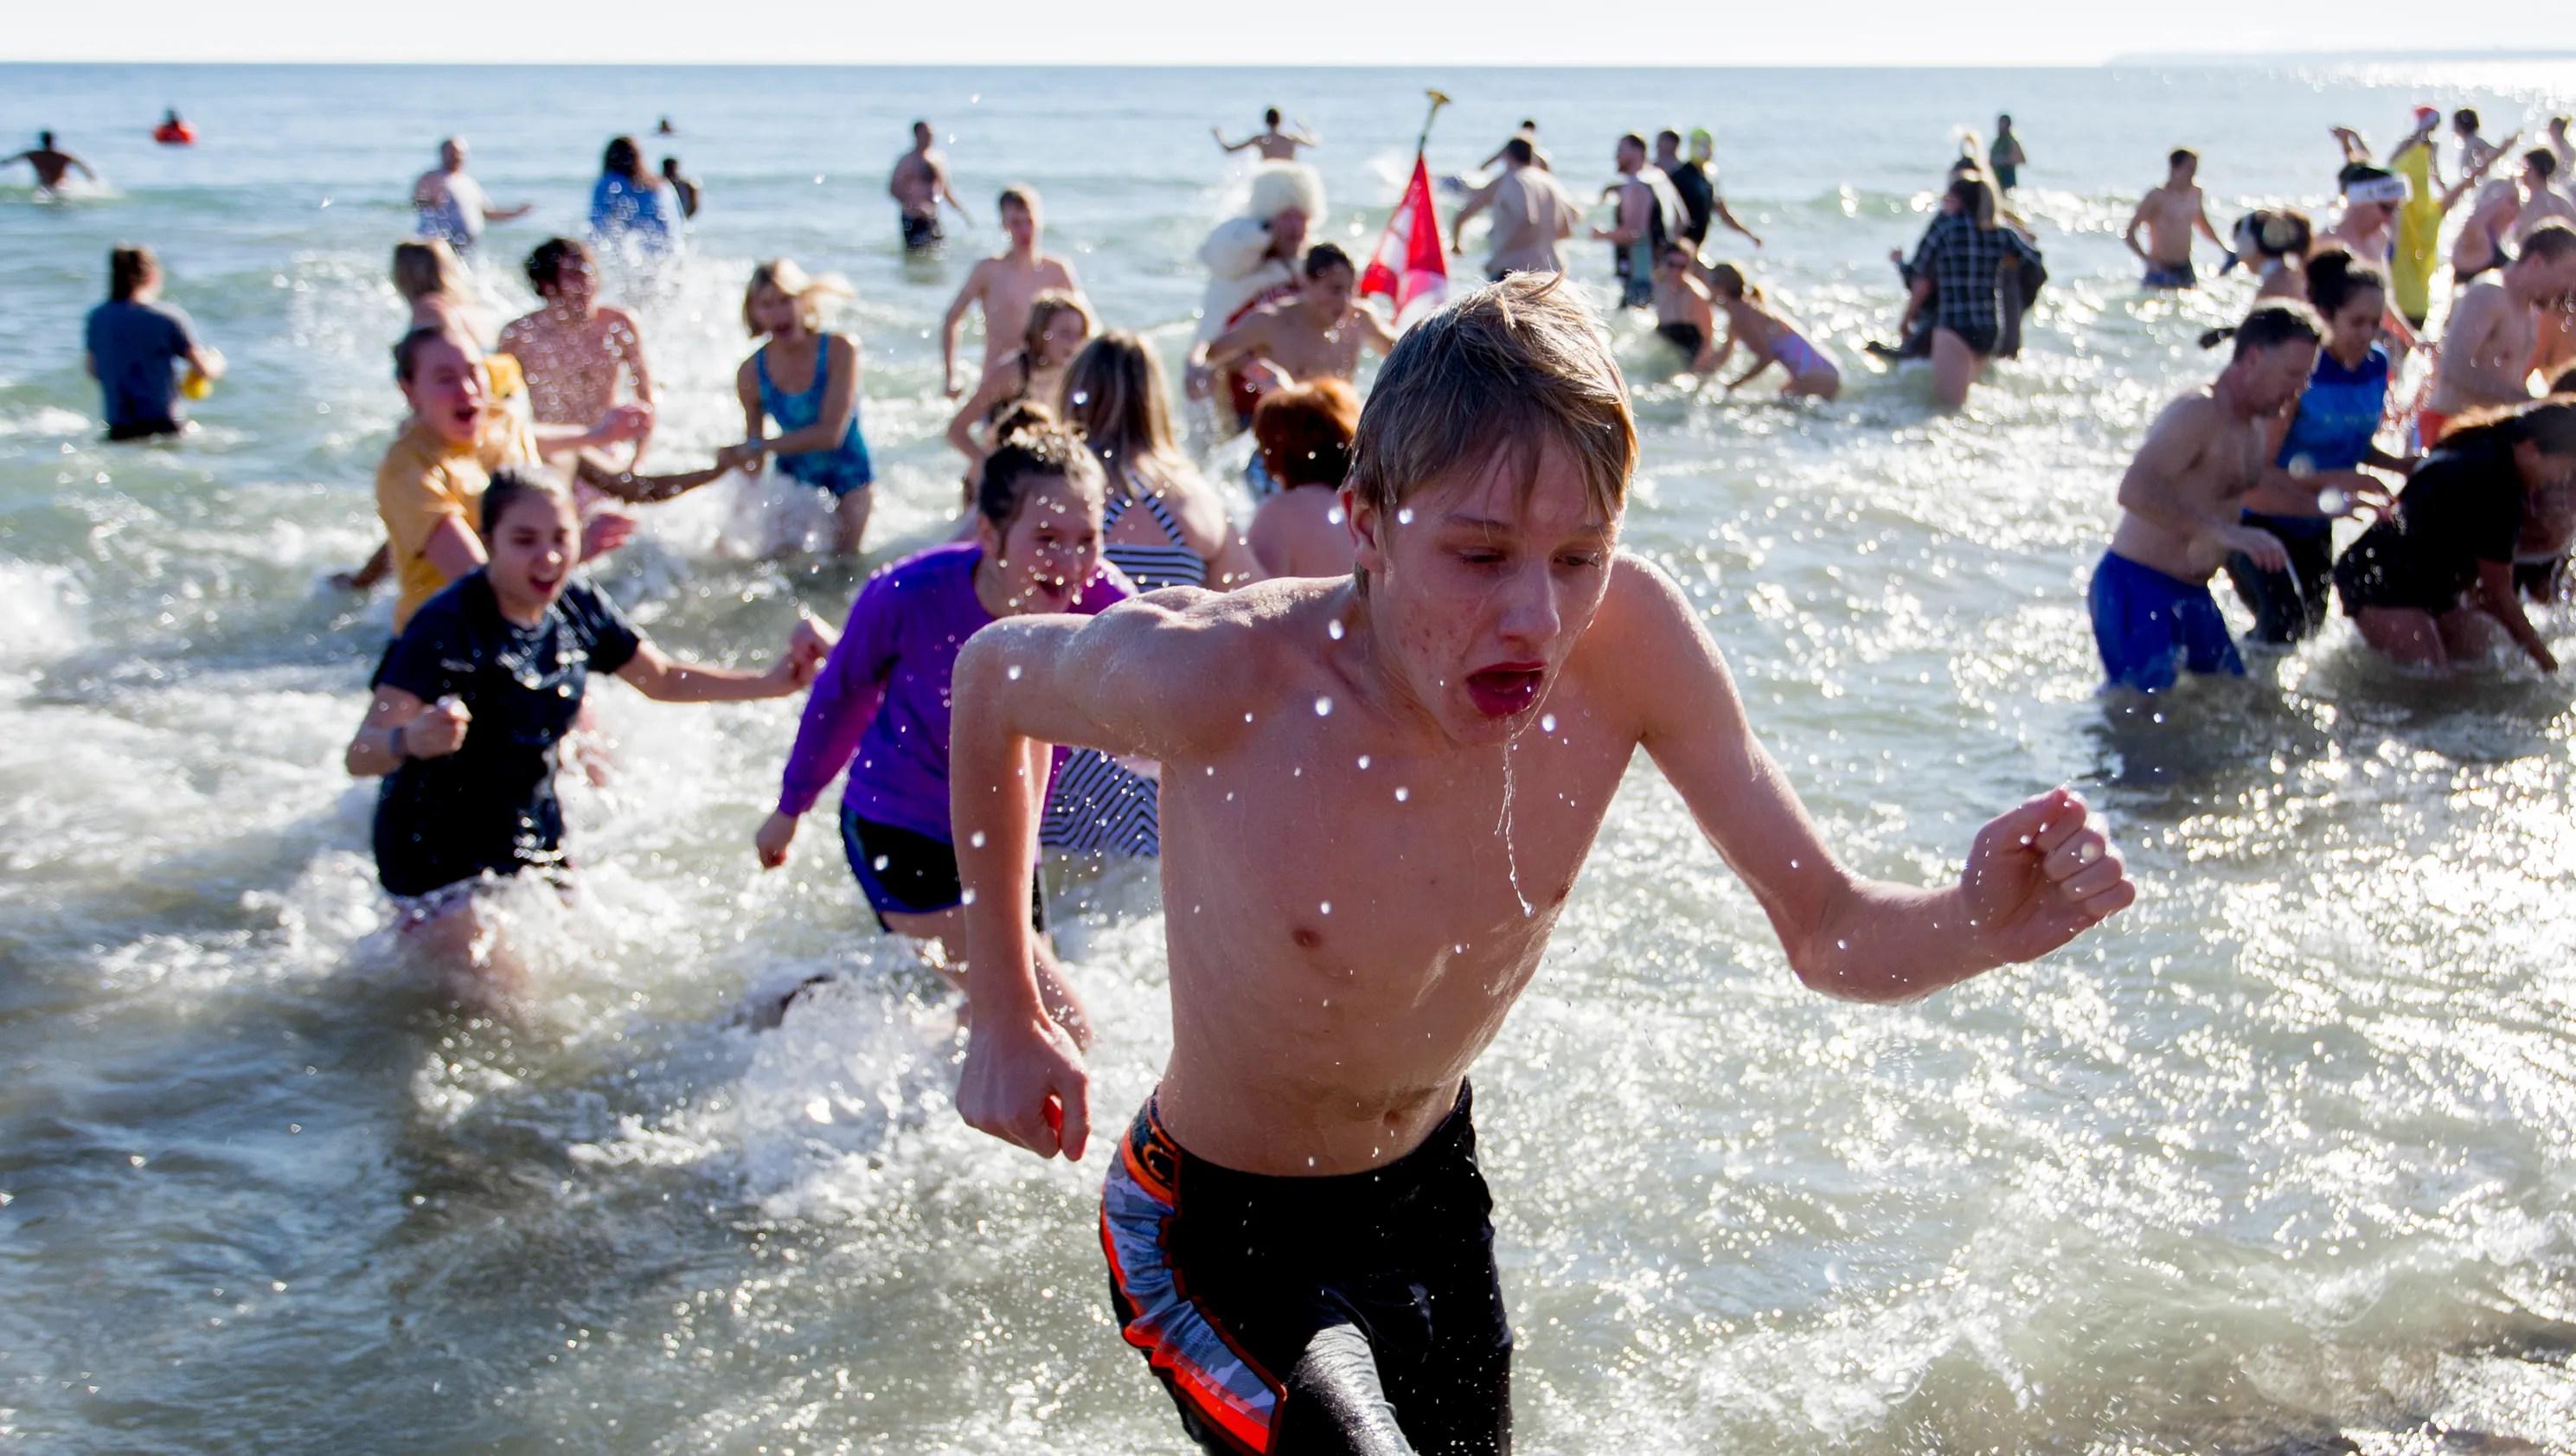 Thousands converge on Bradford Beach for 2017 Polar Bear Plunge